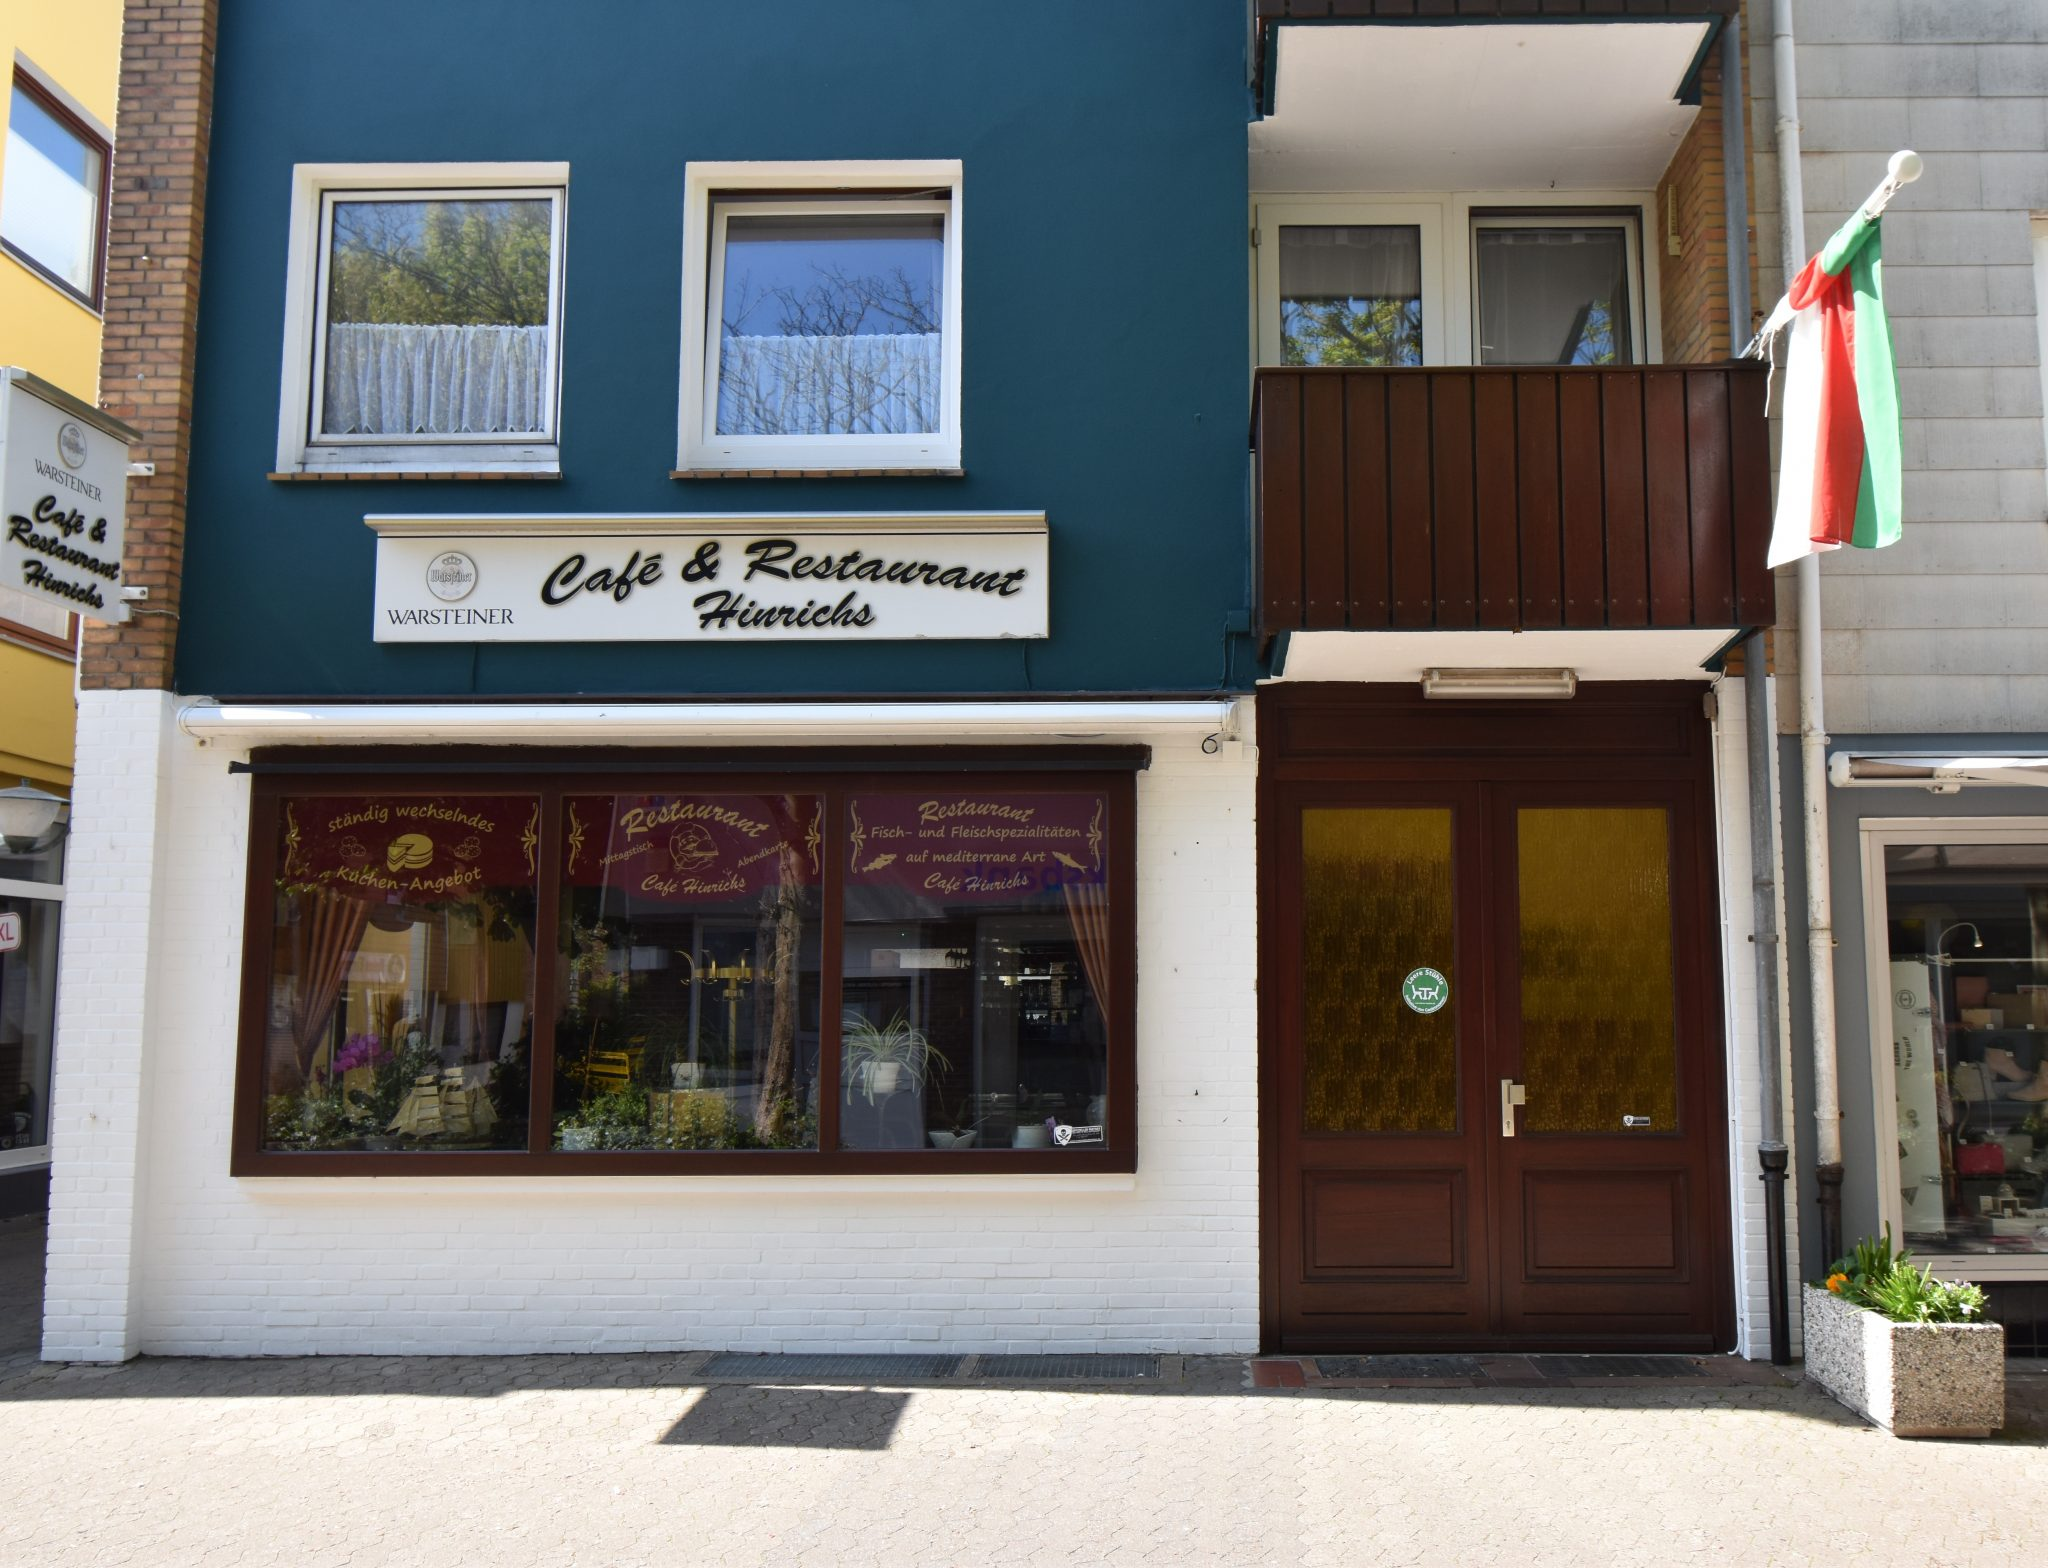 Café / Restaurant Hinrichs